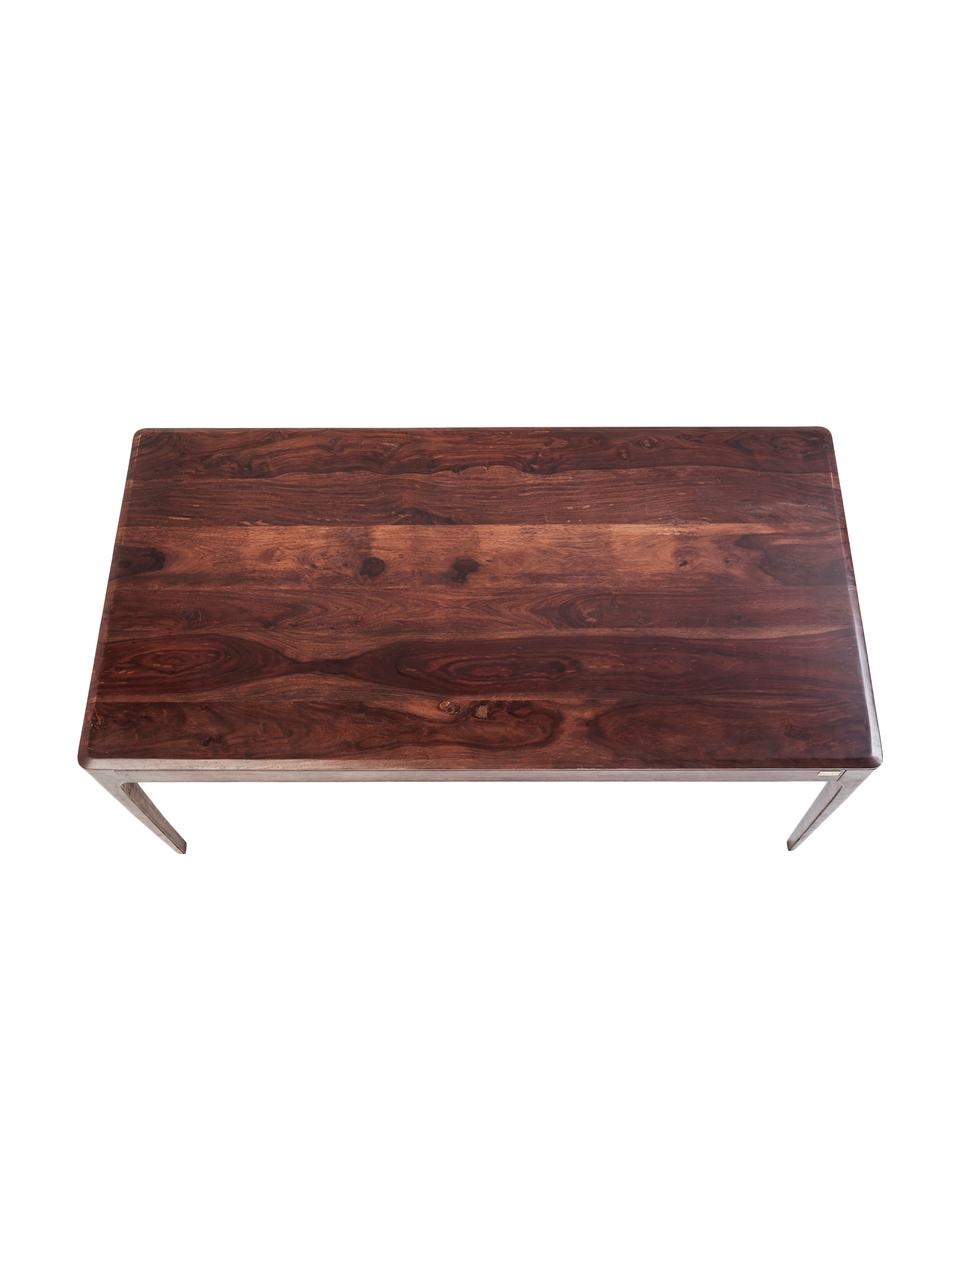 Table en bois massif Brooklyn, Couleur noisette